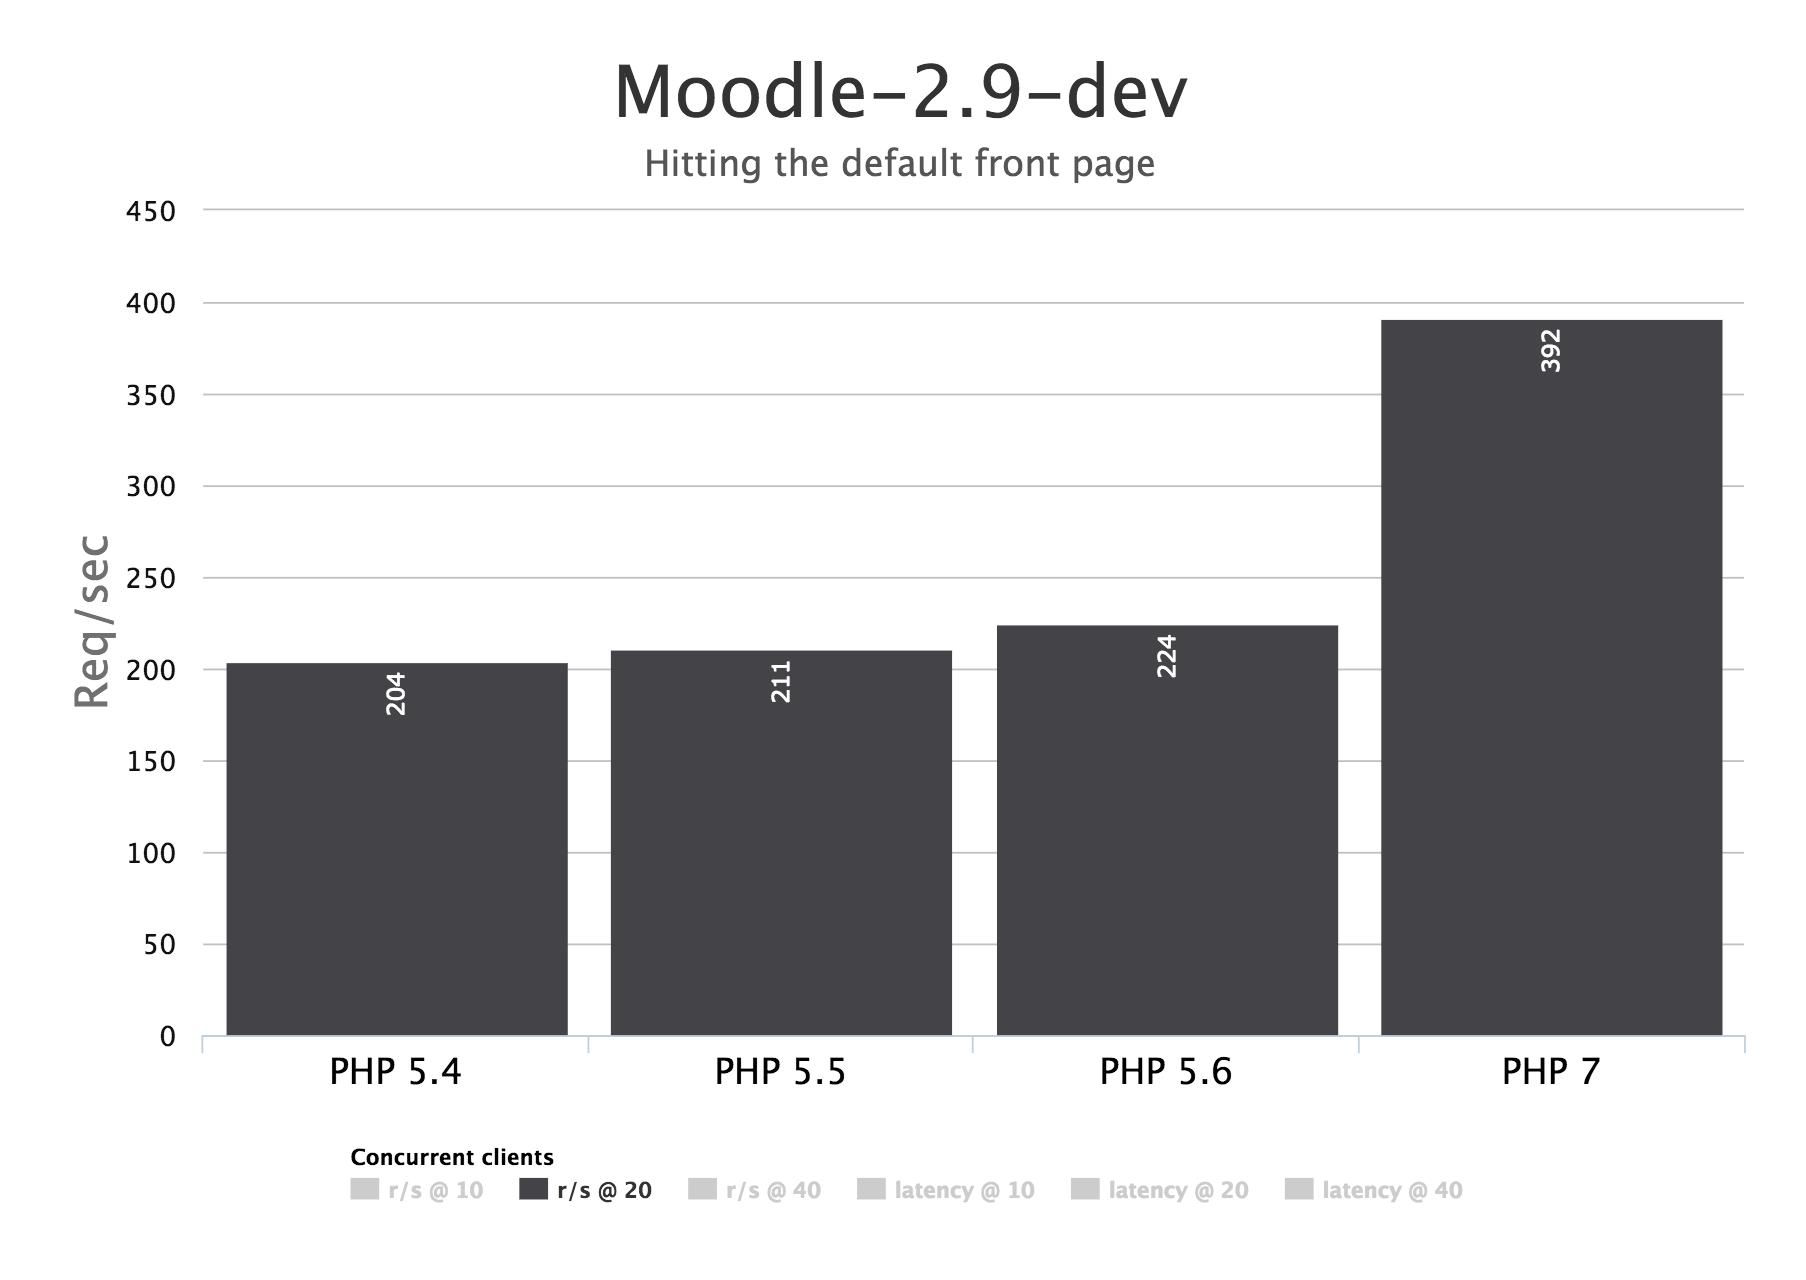 Moodle 2.9-dev